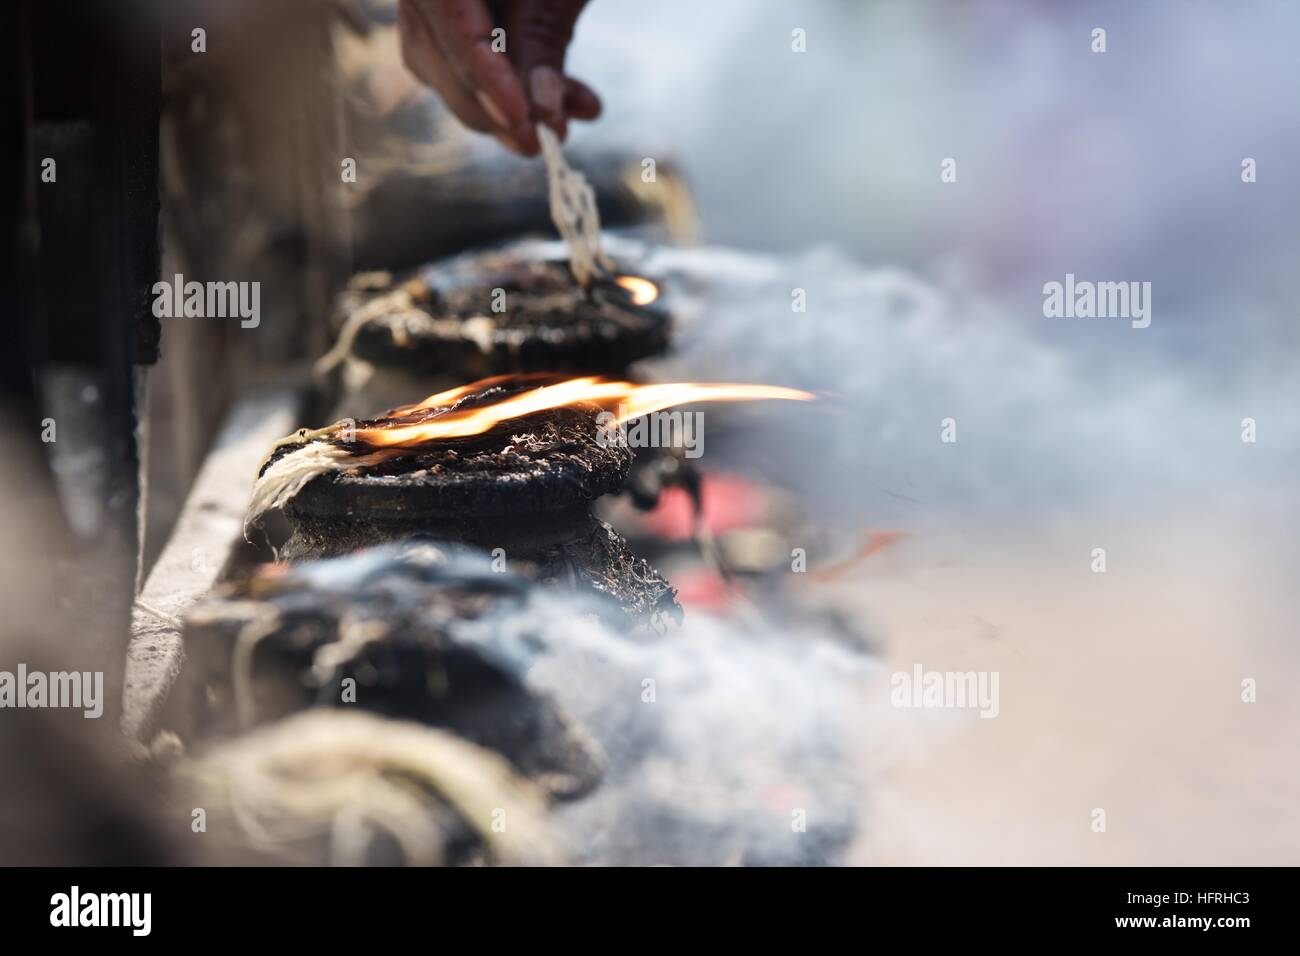 La Credenza Religiosa : Kathmandu bhaktapur tempio culto lampade a olio string incendio fumo